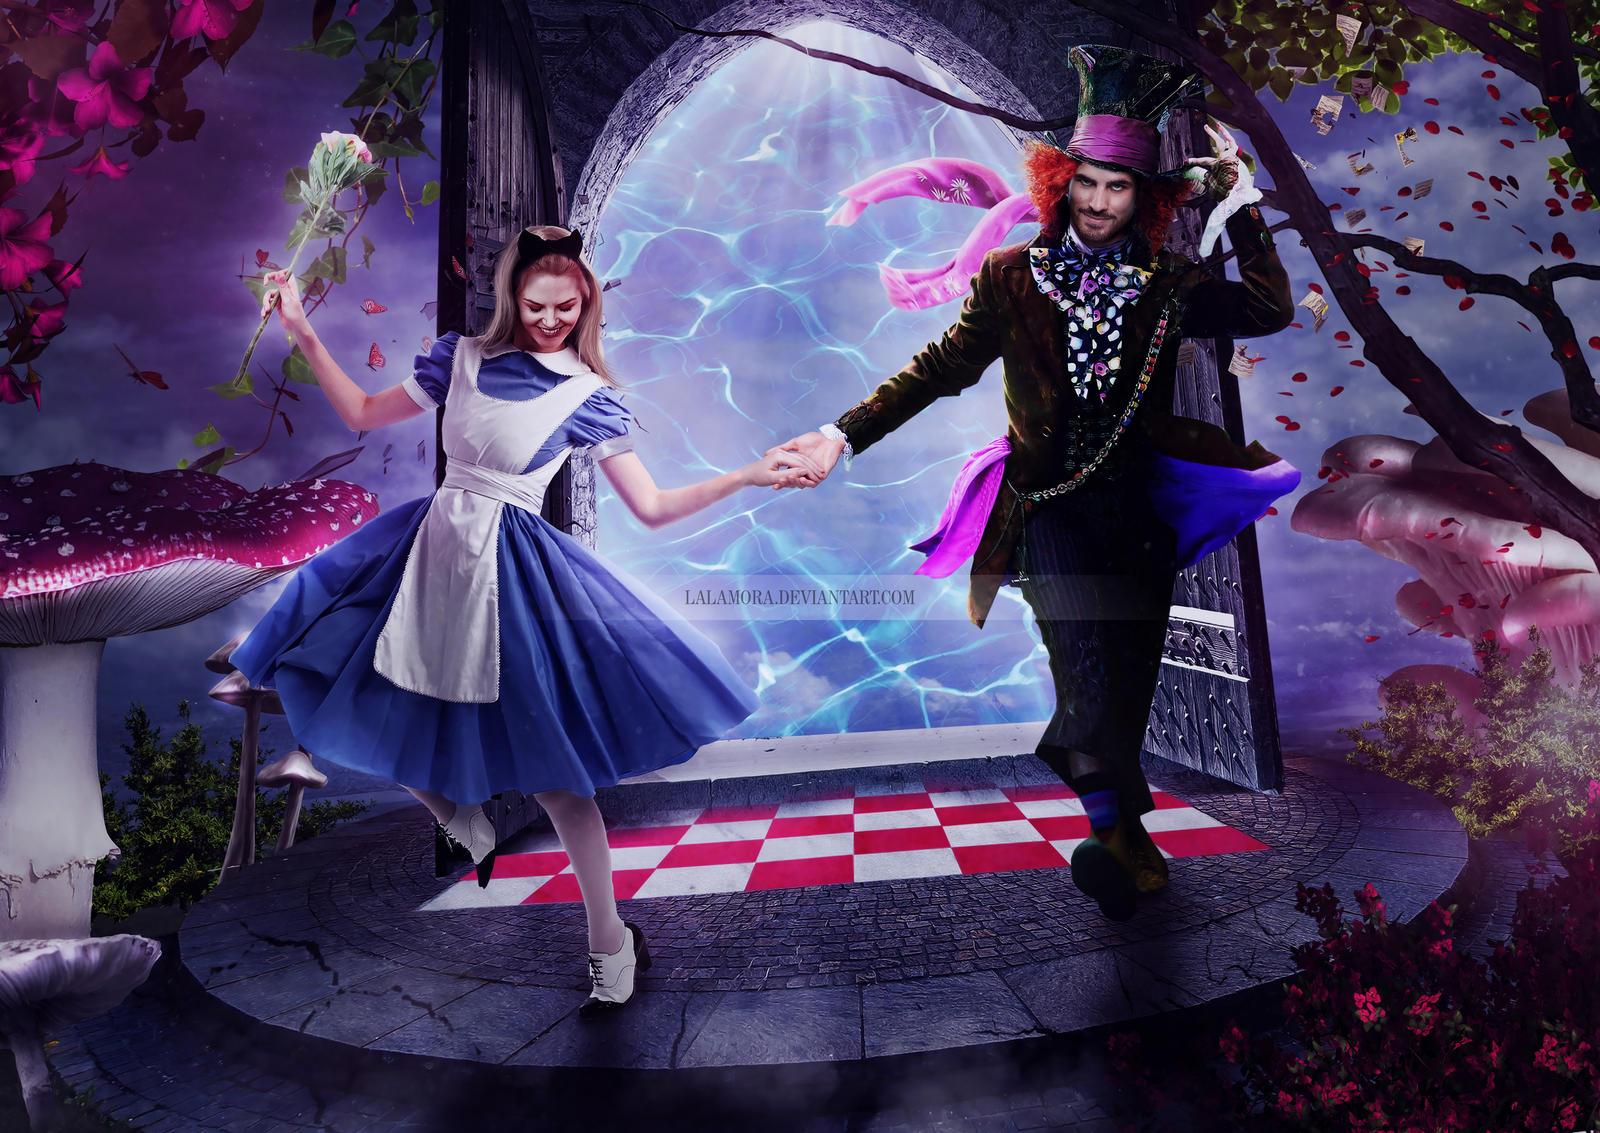 Emma Swan and Killian Jones in Wonderland by LaLaMora on DeviantArt